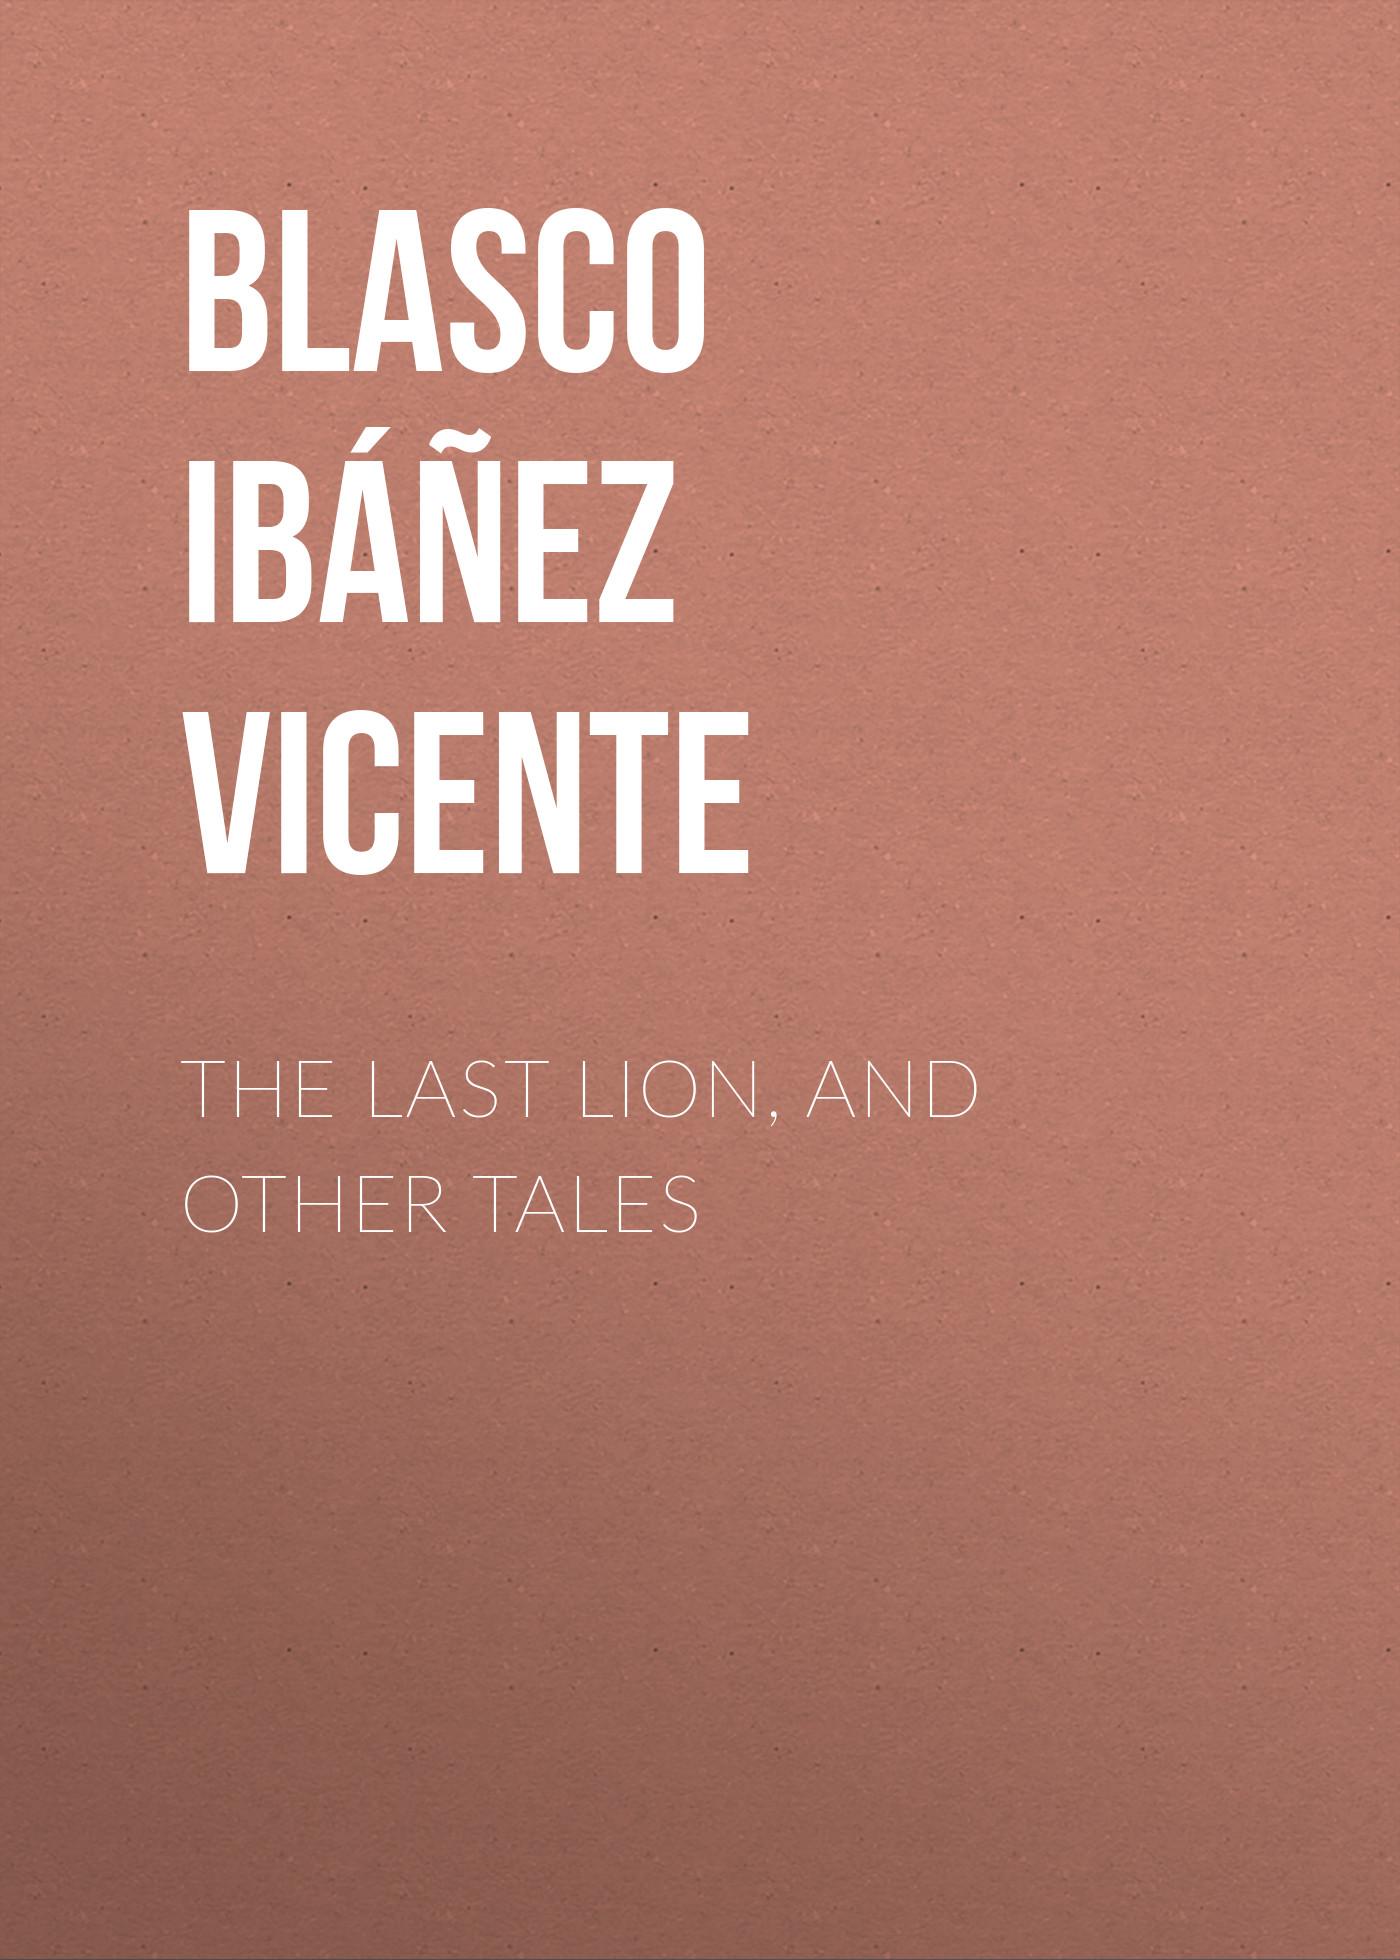 Blasco Ibáñez Vicente The Last Lion, and Other Tales blasco ibáñez vicente the four horsemen of the apocalypse